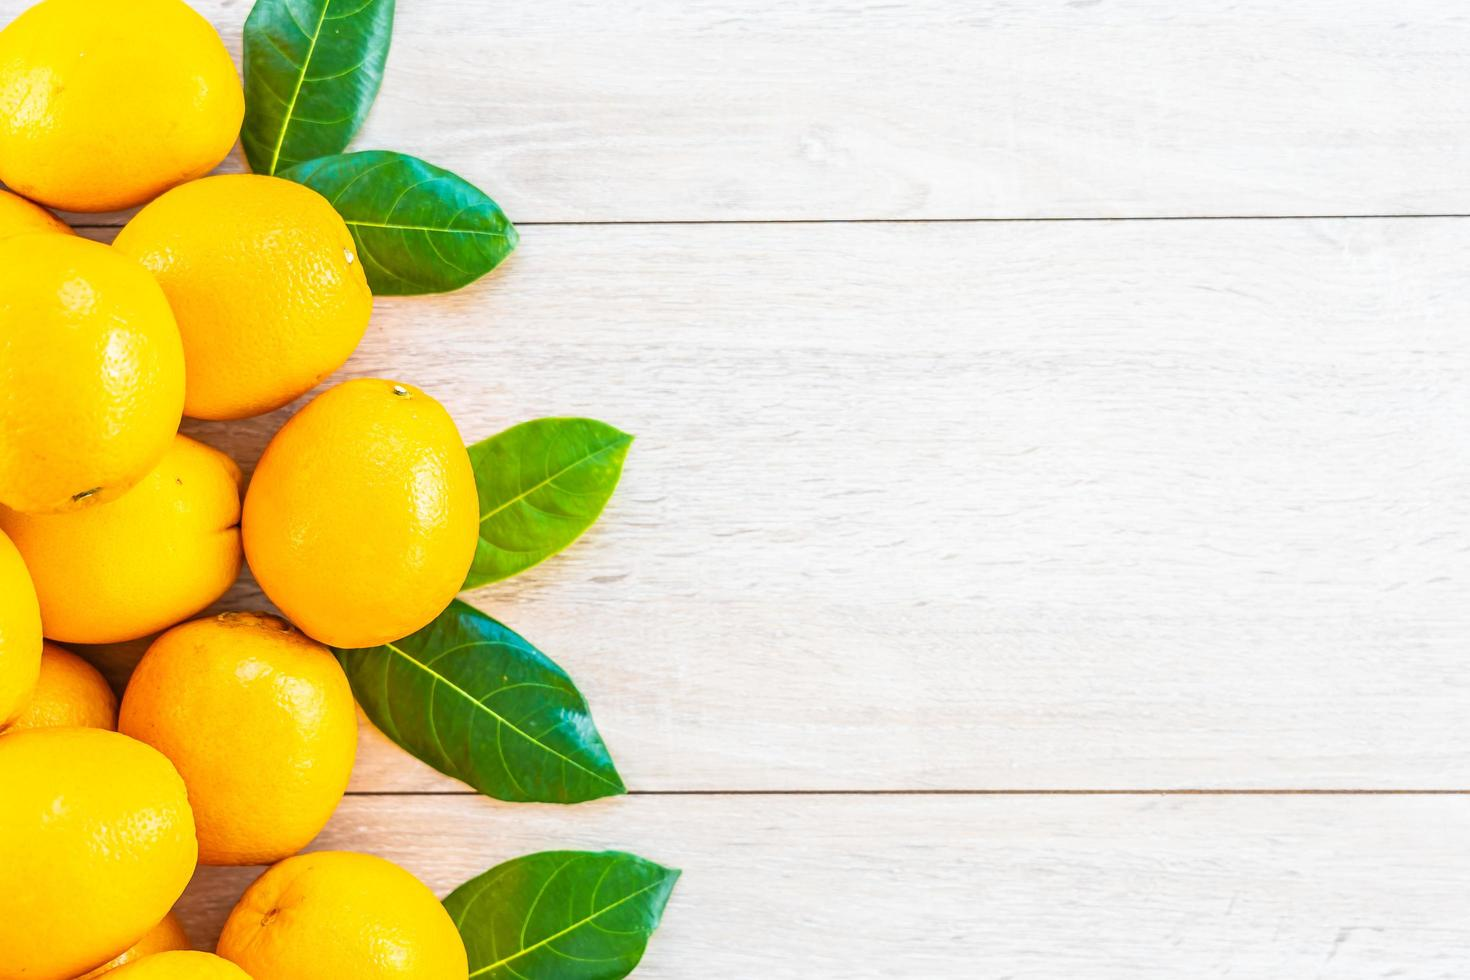 Fresh oranges on the table photo